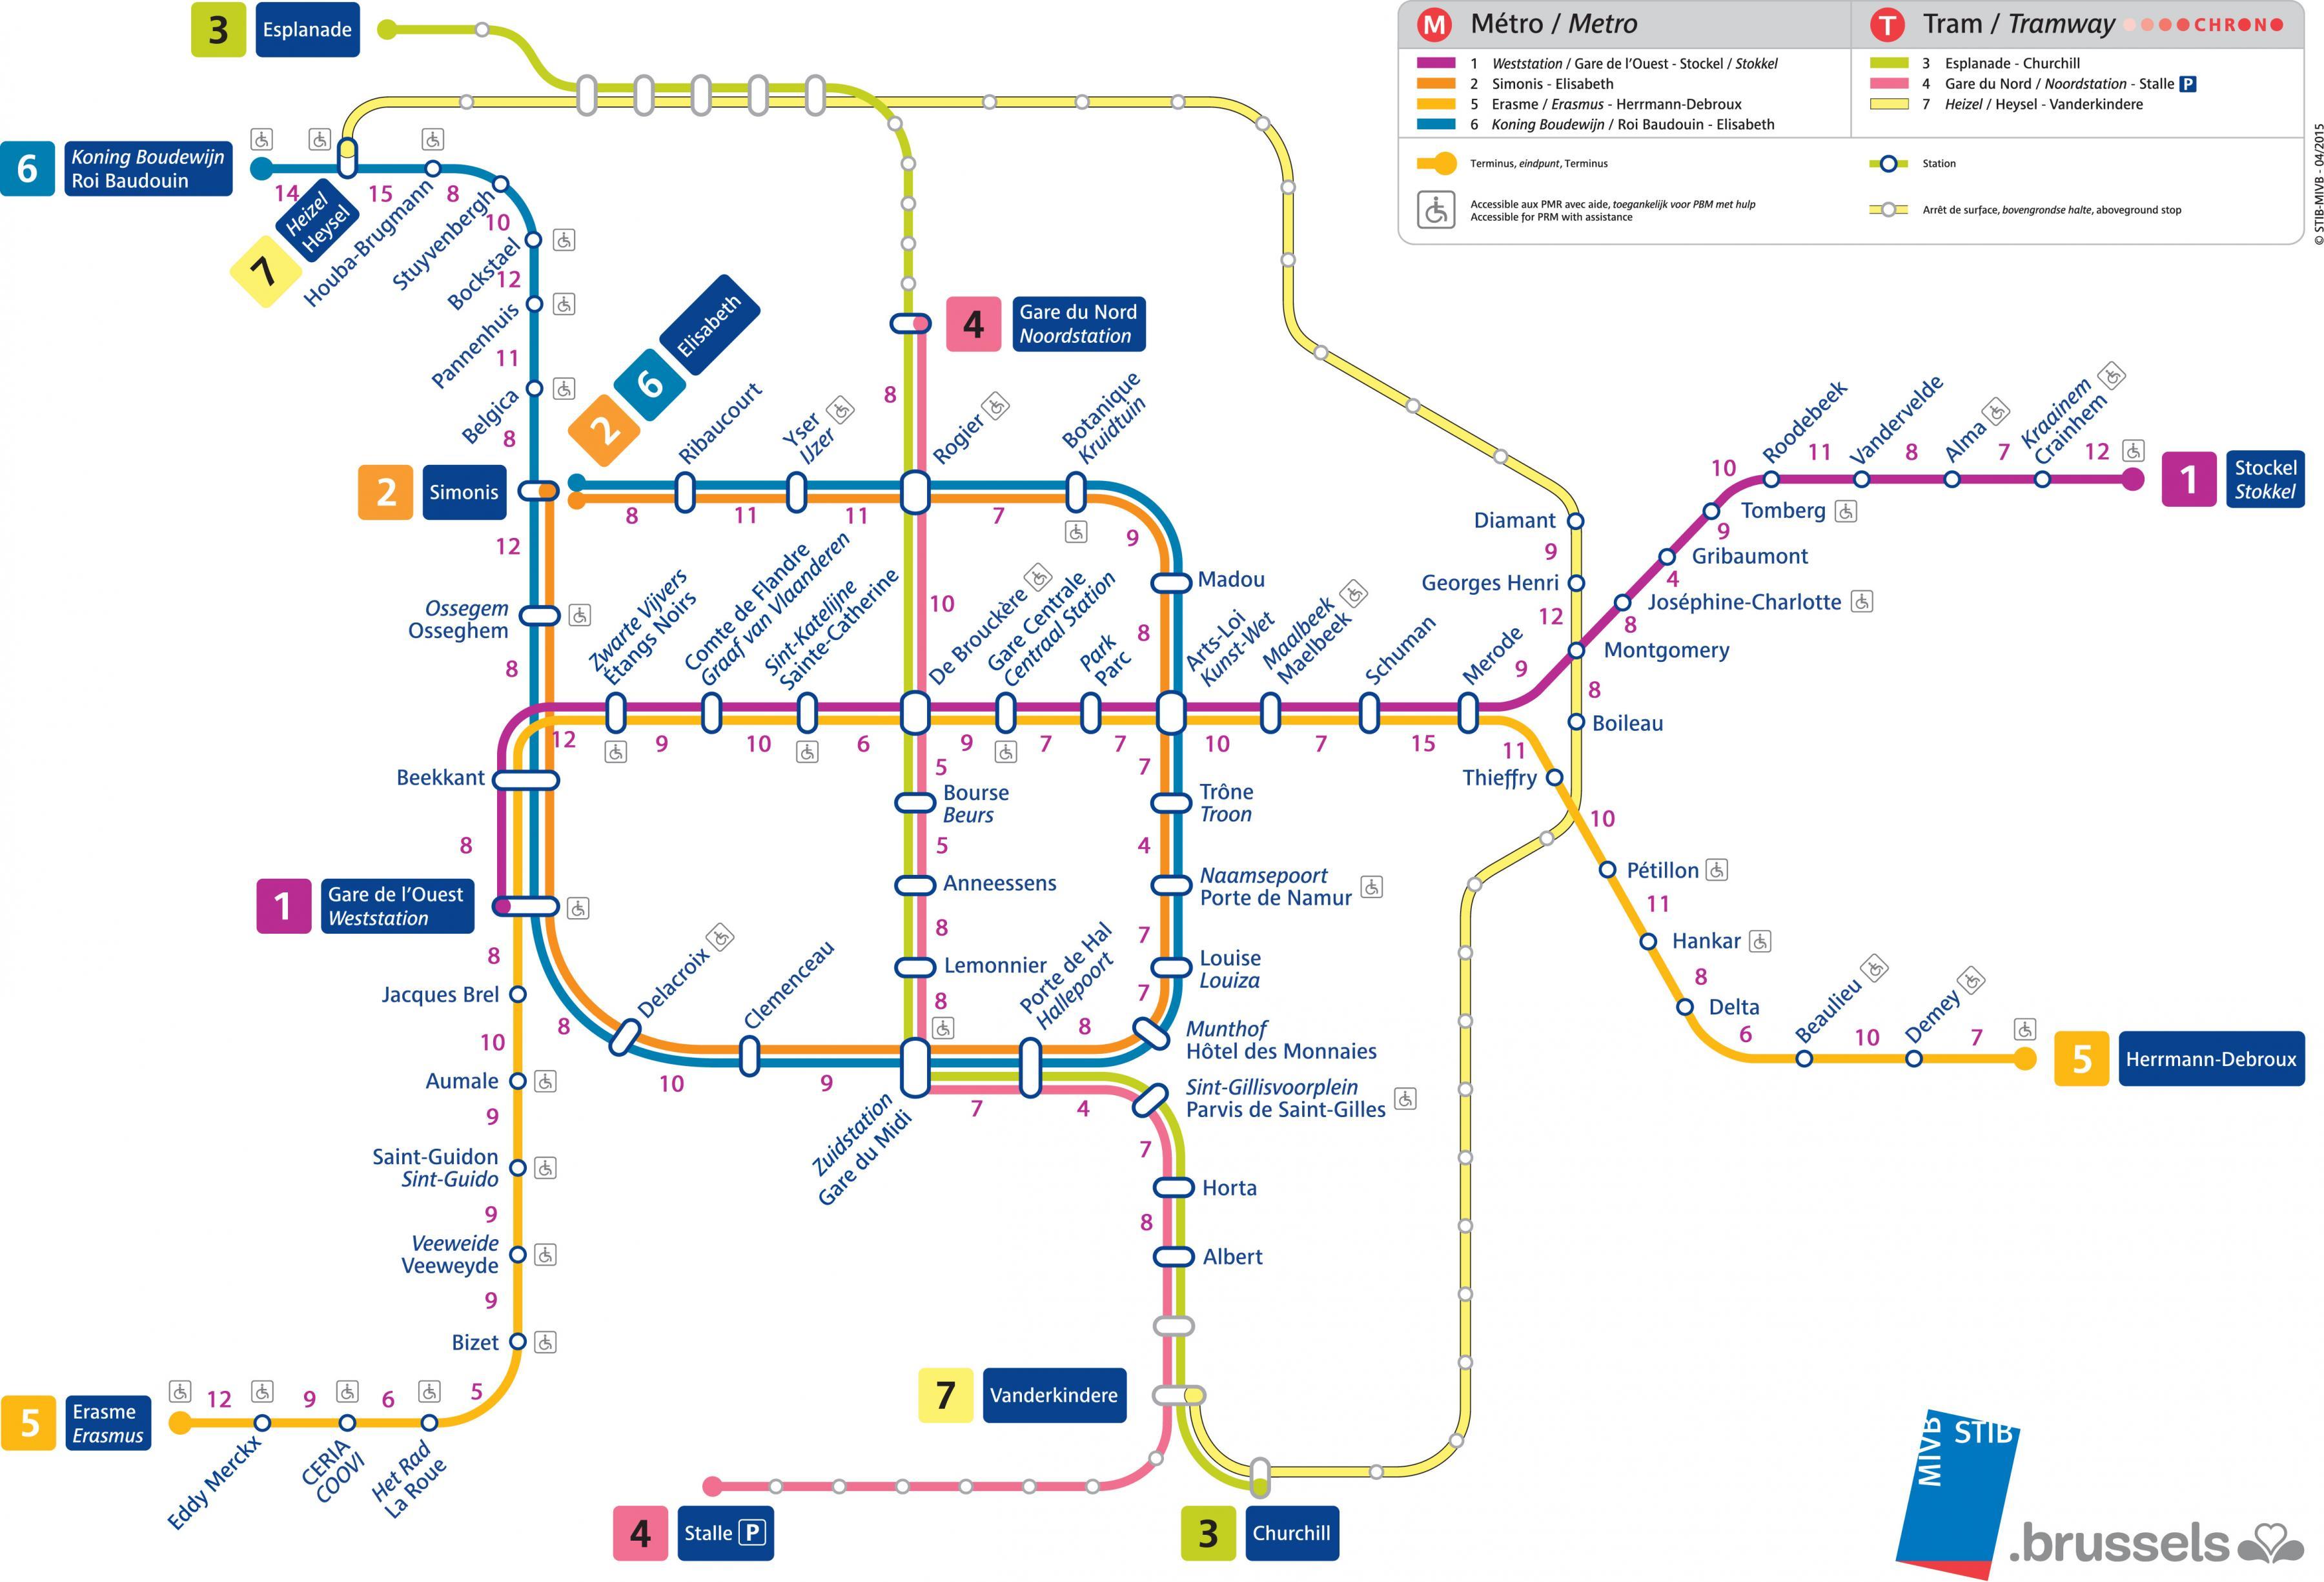 Brussels tram map - Brussels tram network map (Belgium)